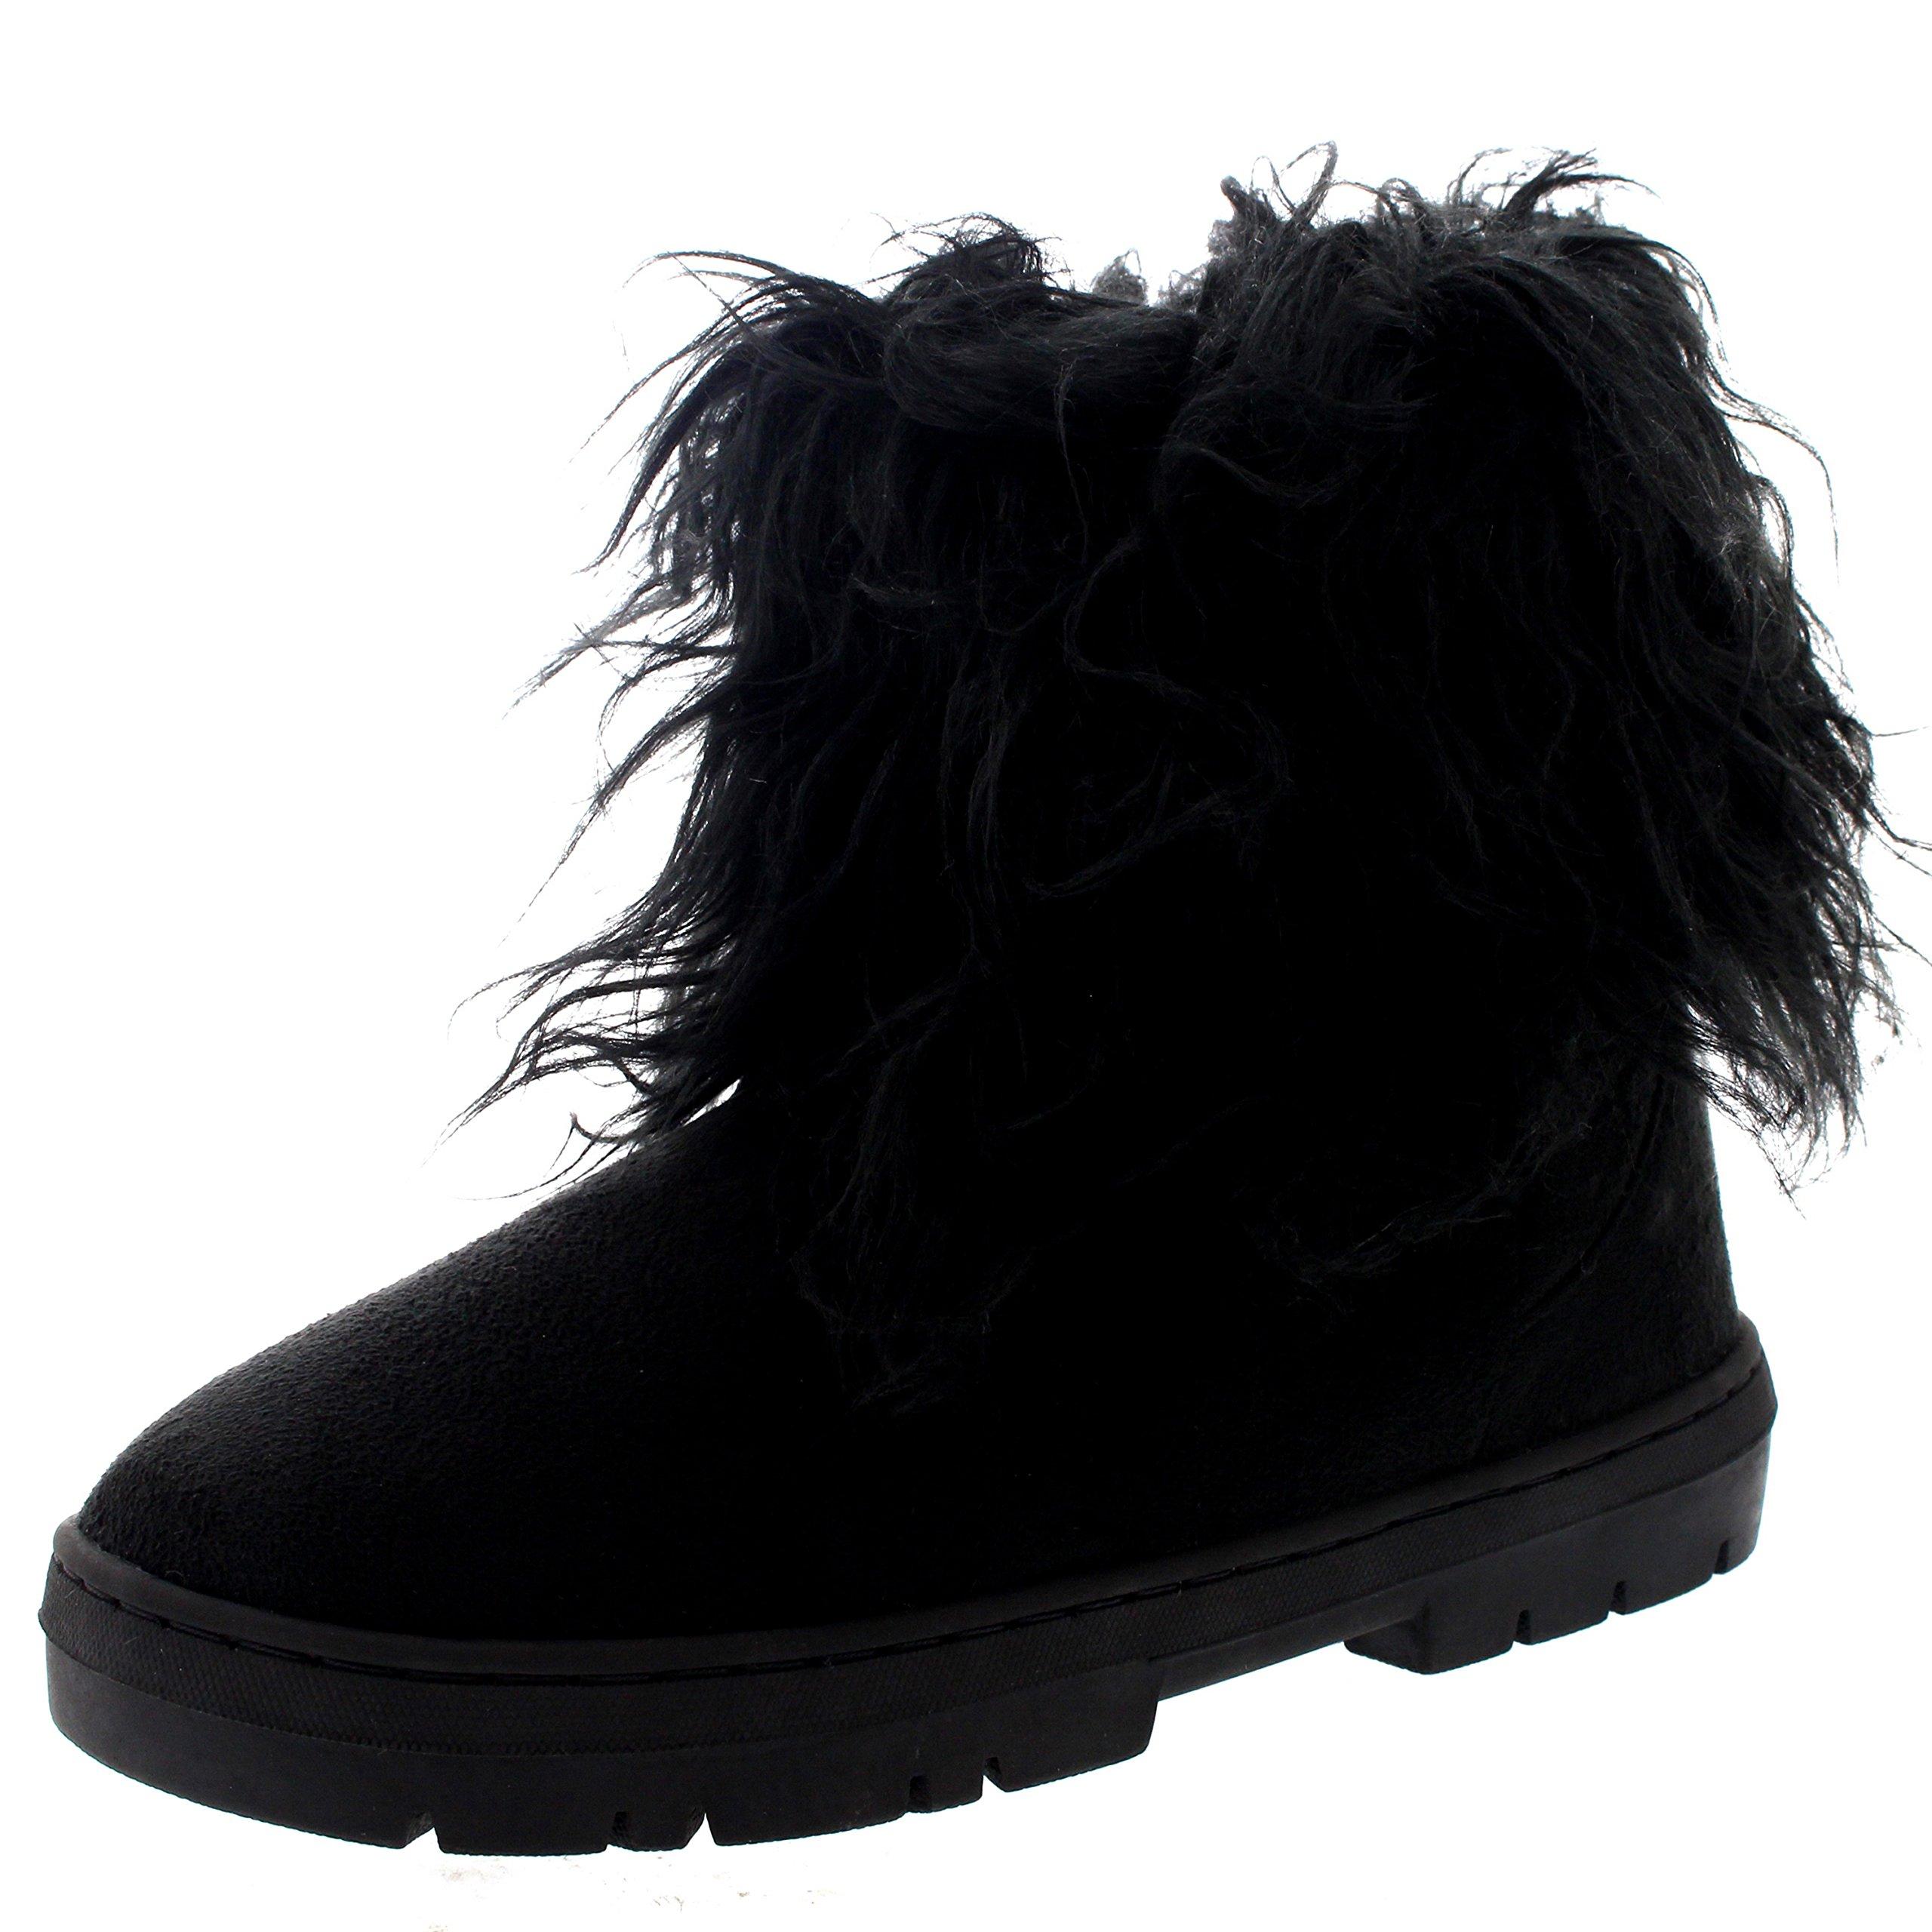 Womens Short Eskimo Winter Waterproof Hard Sole Mid Calf Boots - Black - US7/EU38 - BA0490